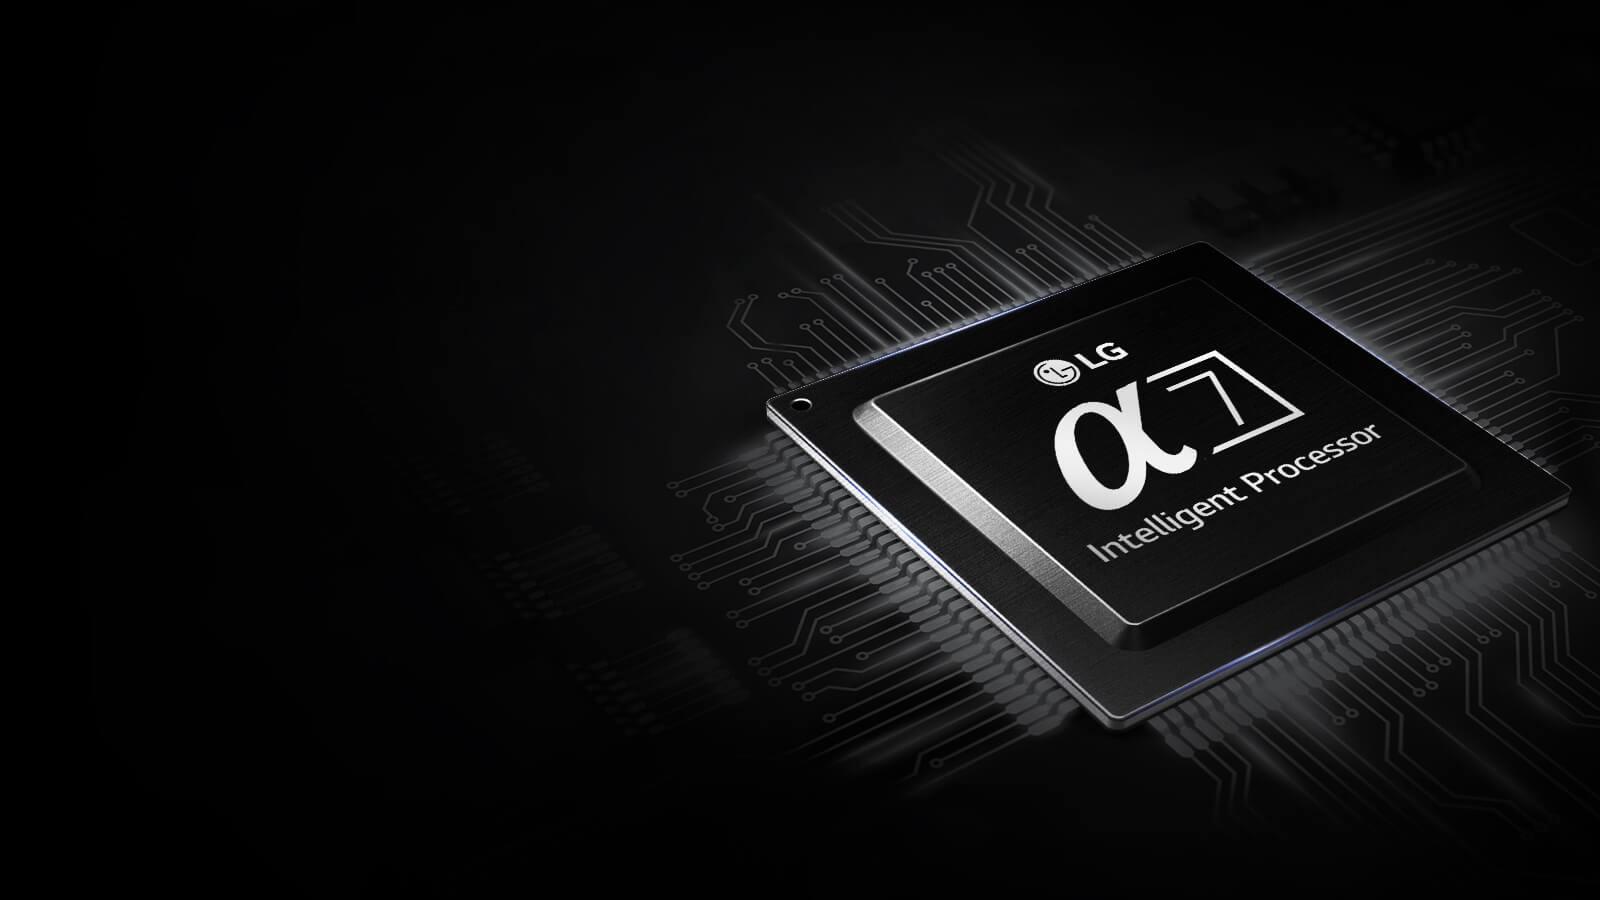 LG SUHD alpha7 Prozessor